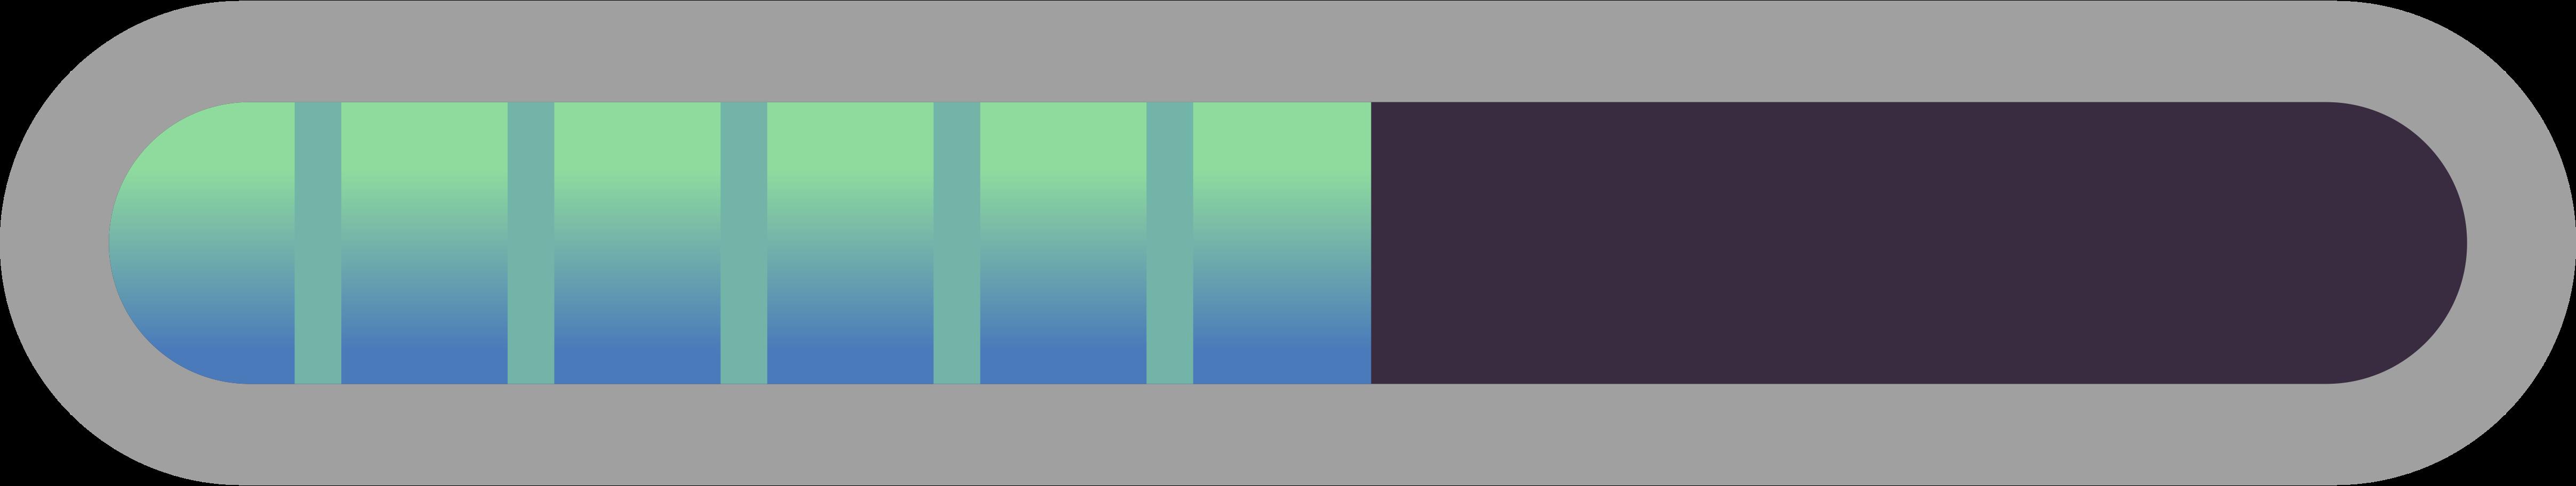 progress-bar Clipart illustration in PNG, SVG